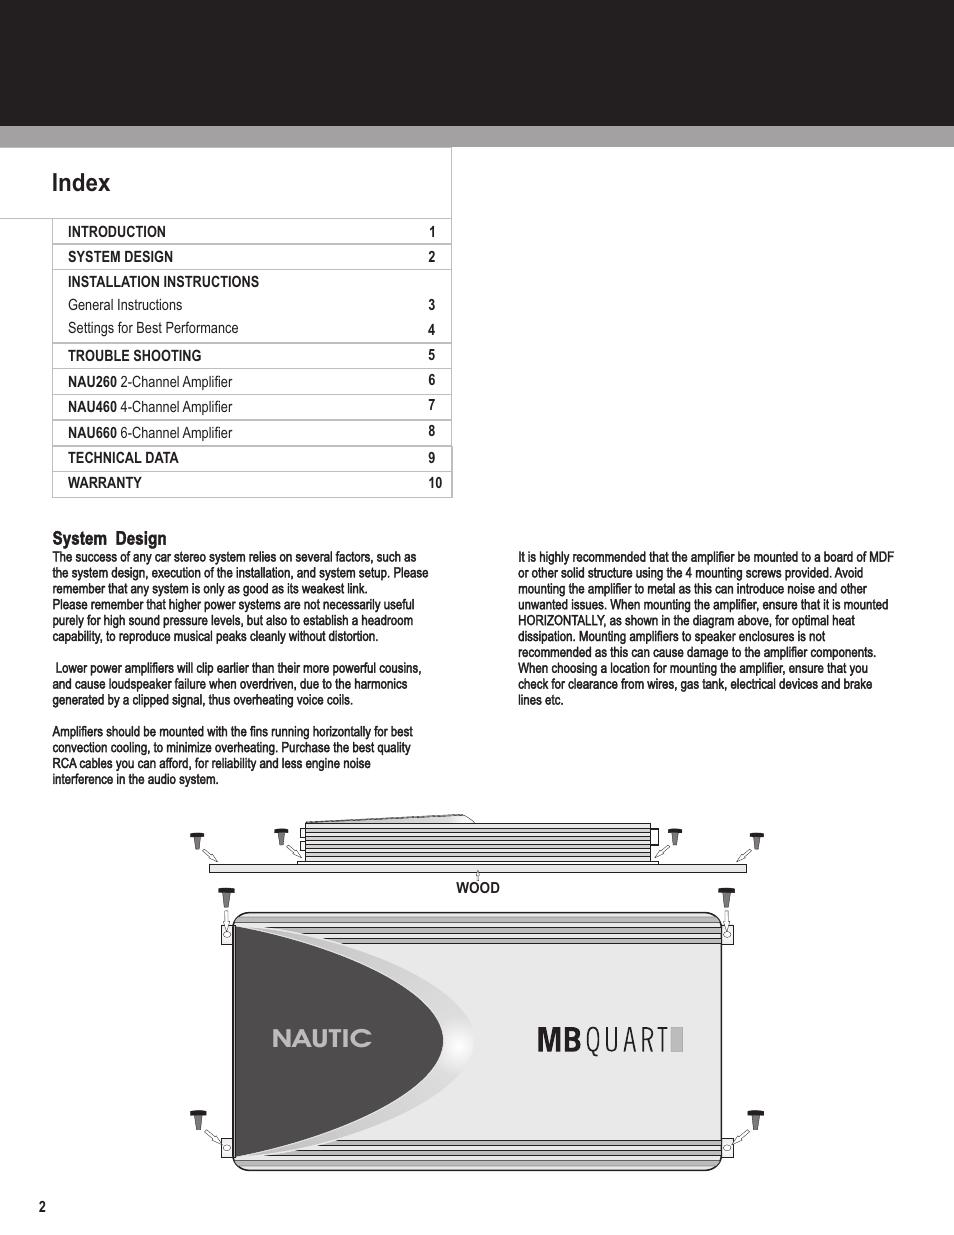 hight resolution of nautic index mb quart nautic amplifier nau460 user manual page 2 10